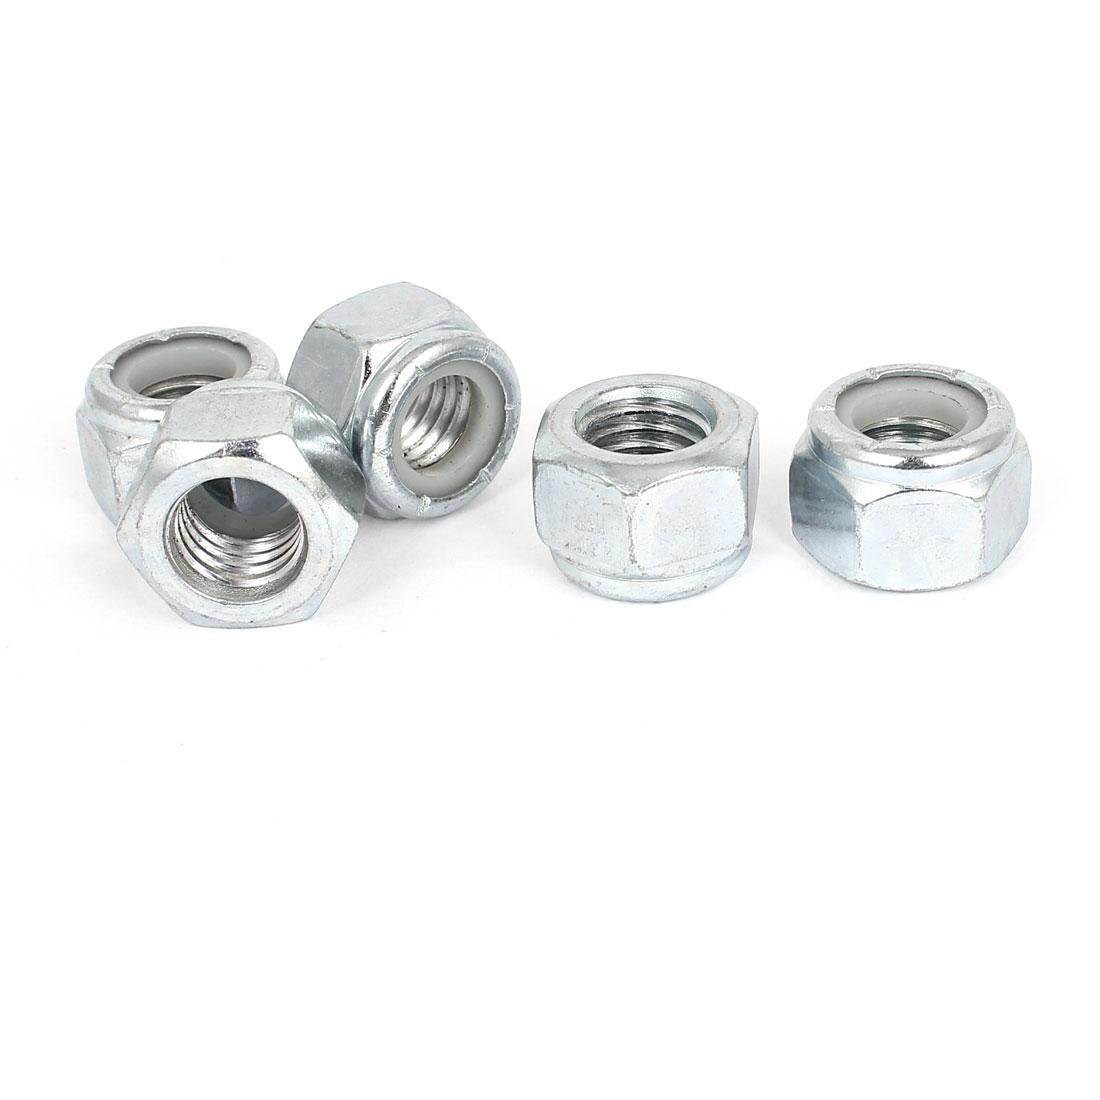 "5pcs Zinc Plated Nylock Self-Locking Nylon Insert Hex Lock Nuts 9/16""-12"